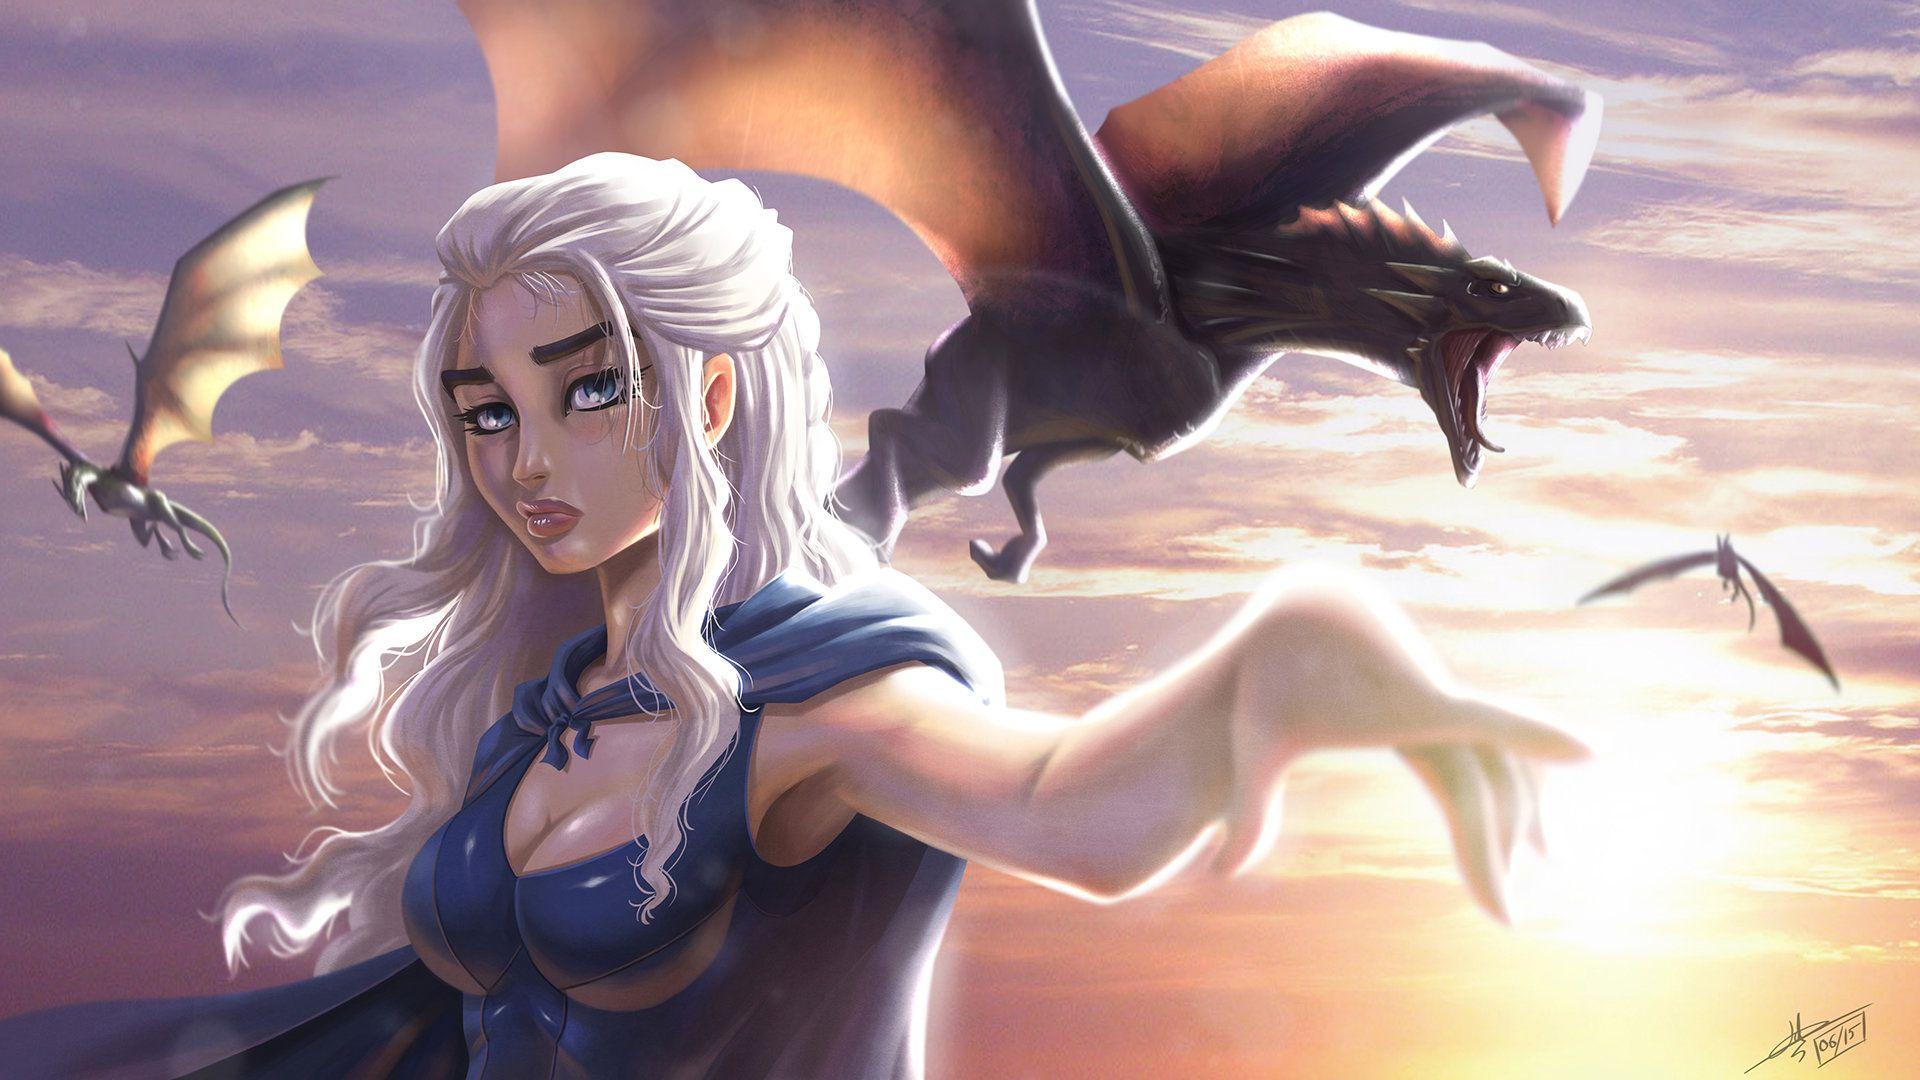 Daenerys targaryen and khal drogo wallpaper daenerys targaryen wedding - Artstation Daenerys Targaryen Mother Of Dragons Hydriss David Lenormand